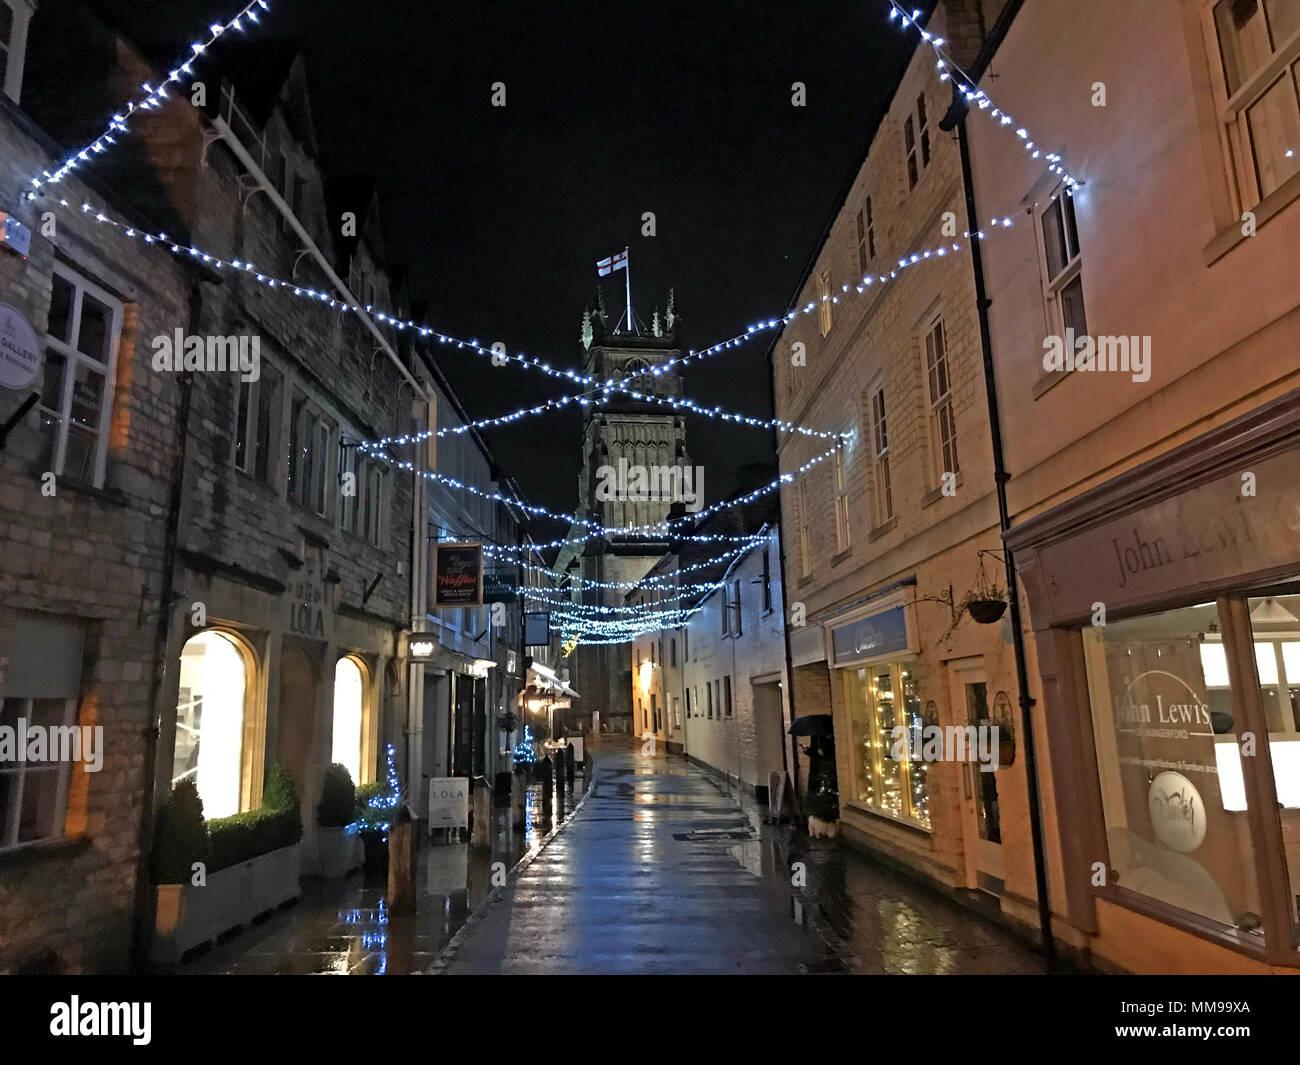 GoTonysmith,@HotpixUK,market town,centre,England,UK,GL7 2NX,GL7,Gloucestershire,Cathedral,Church,street,streets,shop,retail,shops,quaint market town,quaint,tourist,tourism,large Cotswold towns,Roman Corinium,Romans,Roman town,Fosse Way,Church of John The Baptist,John The Baptist,abbey church,thriving,thriving market town,night,at night,evening,dusk,nighttime,night shot,nightshot,lights,Christmas,Christmas Cirencester